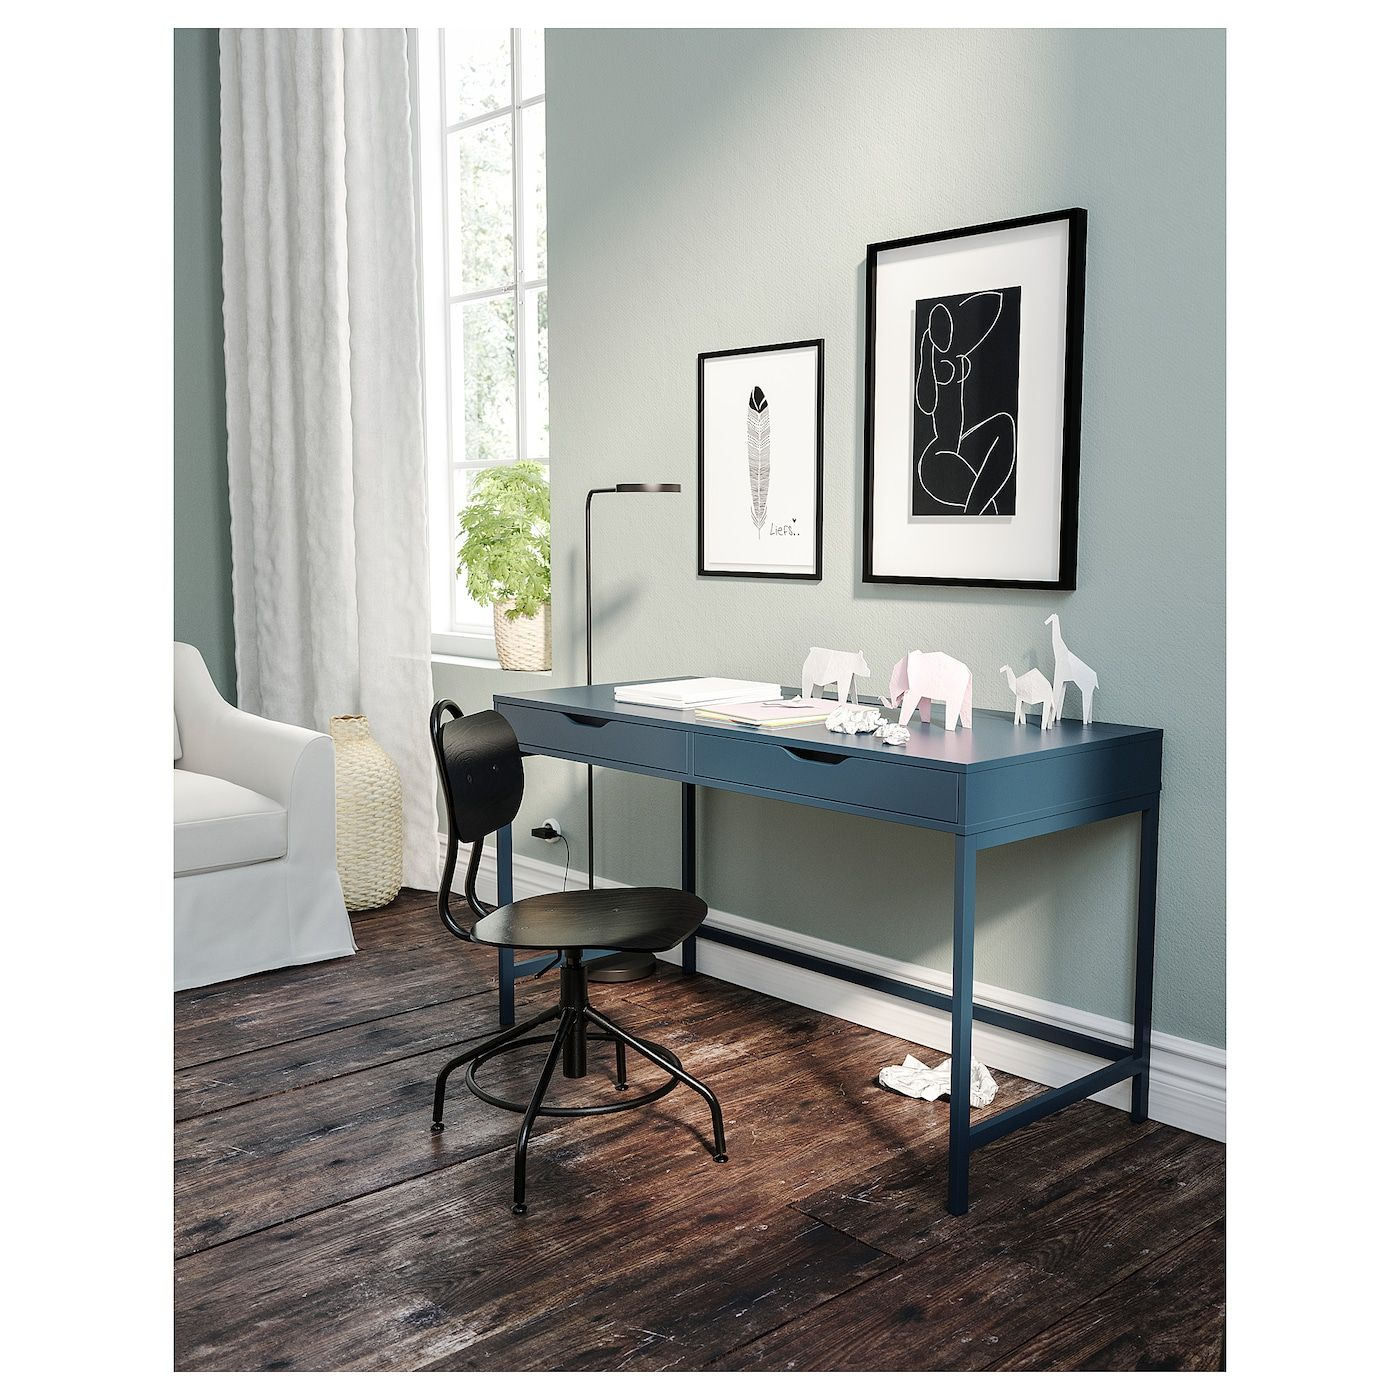 IKEA - KULLABERG Swivel chair, Black